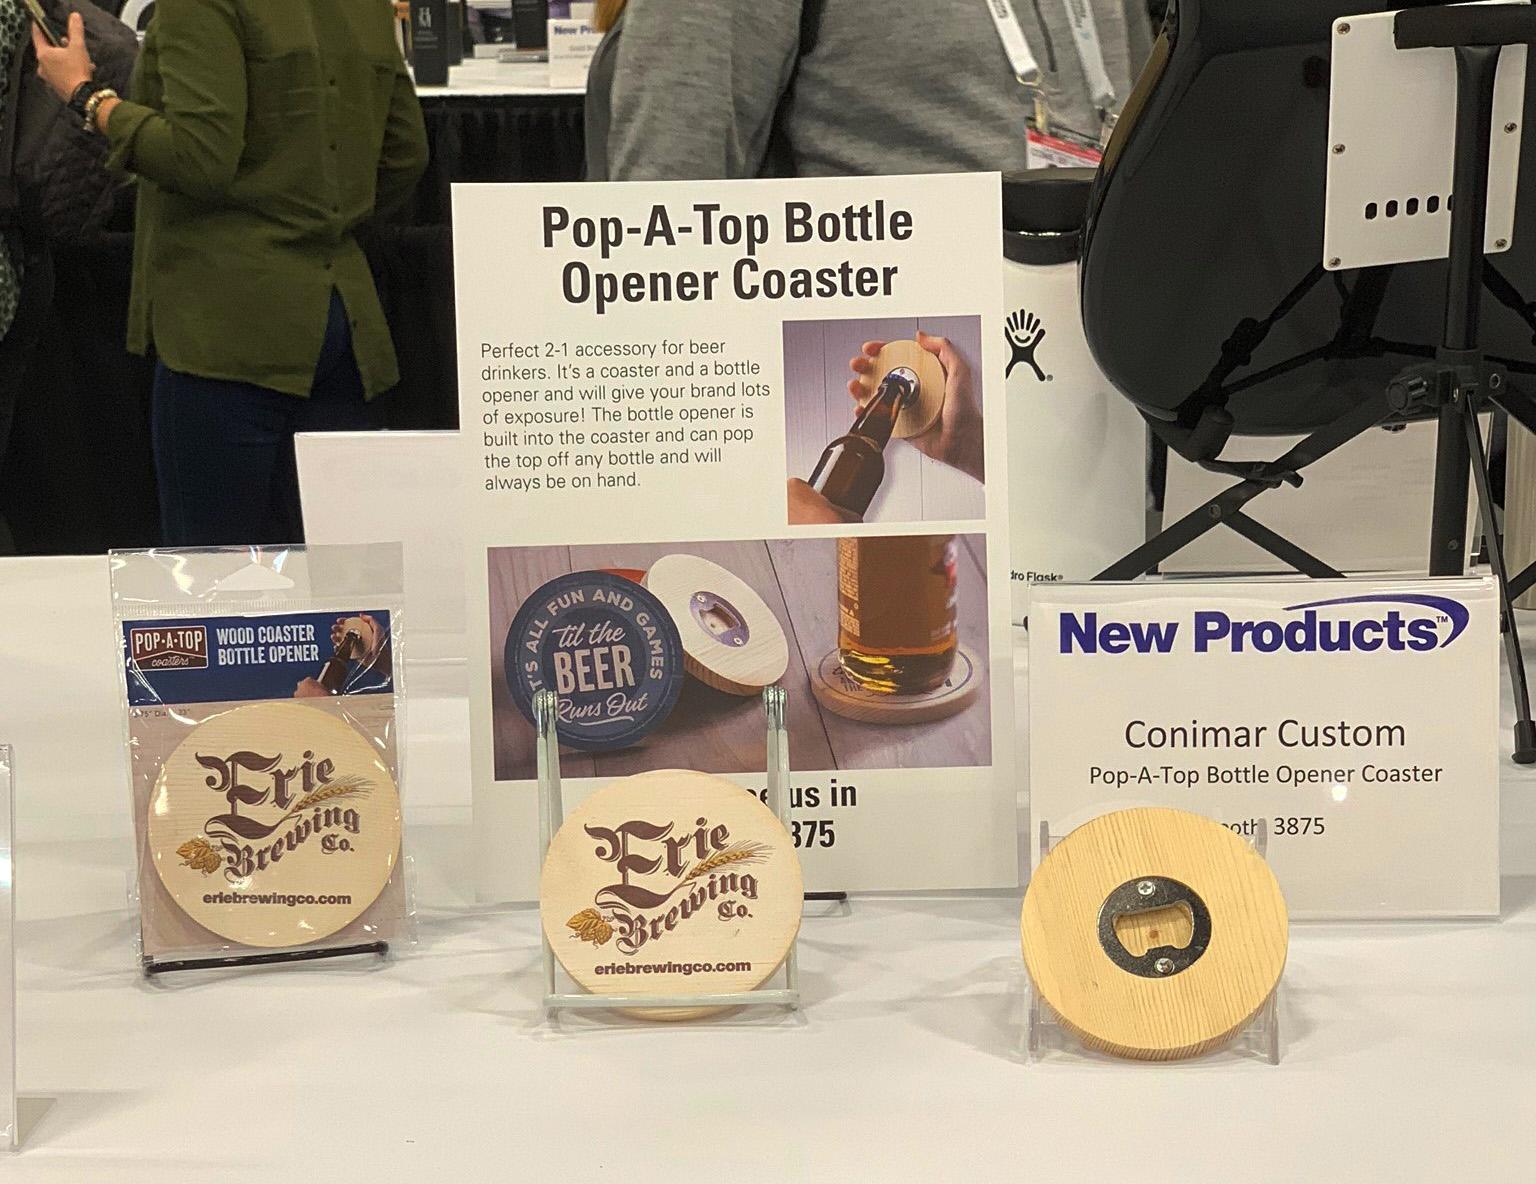 Pop-A-Top Bottle Opener Coaster